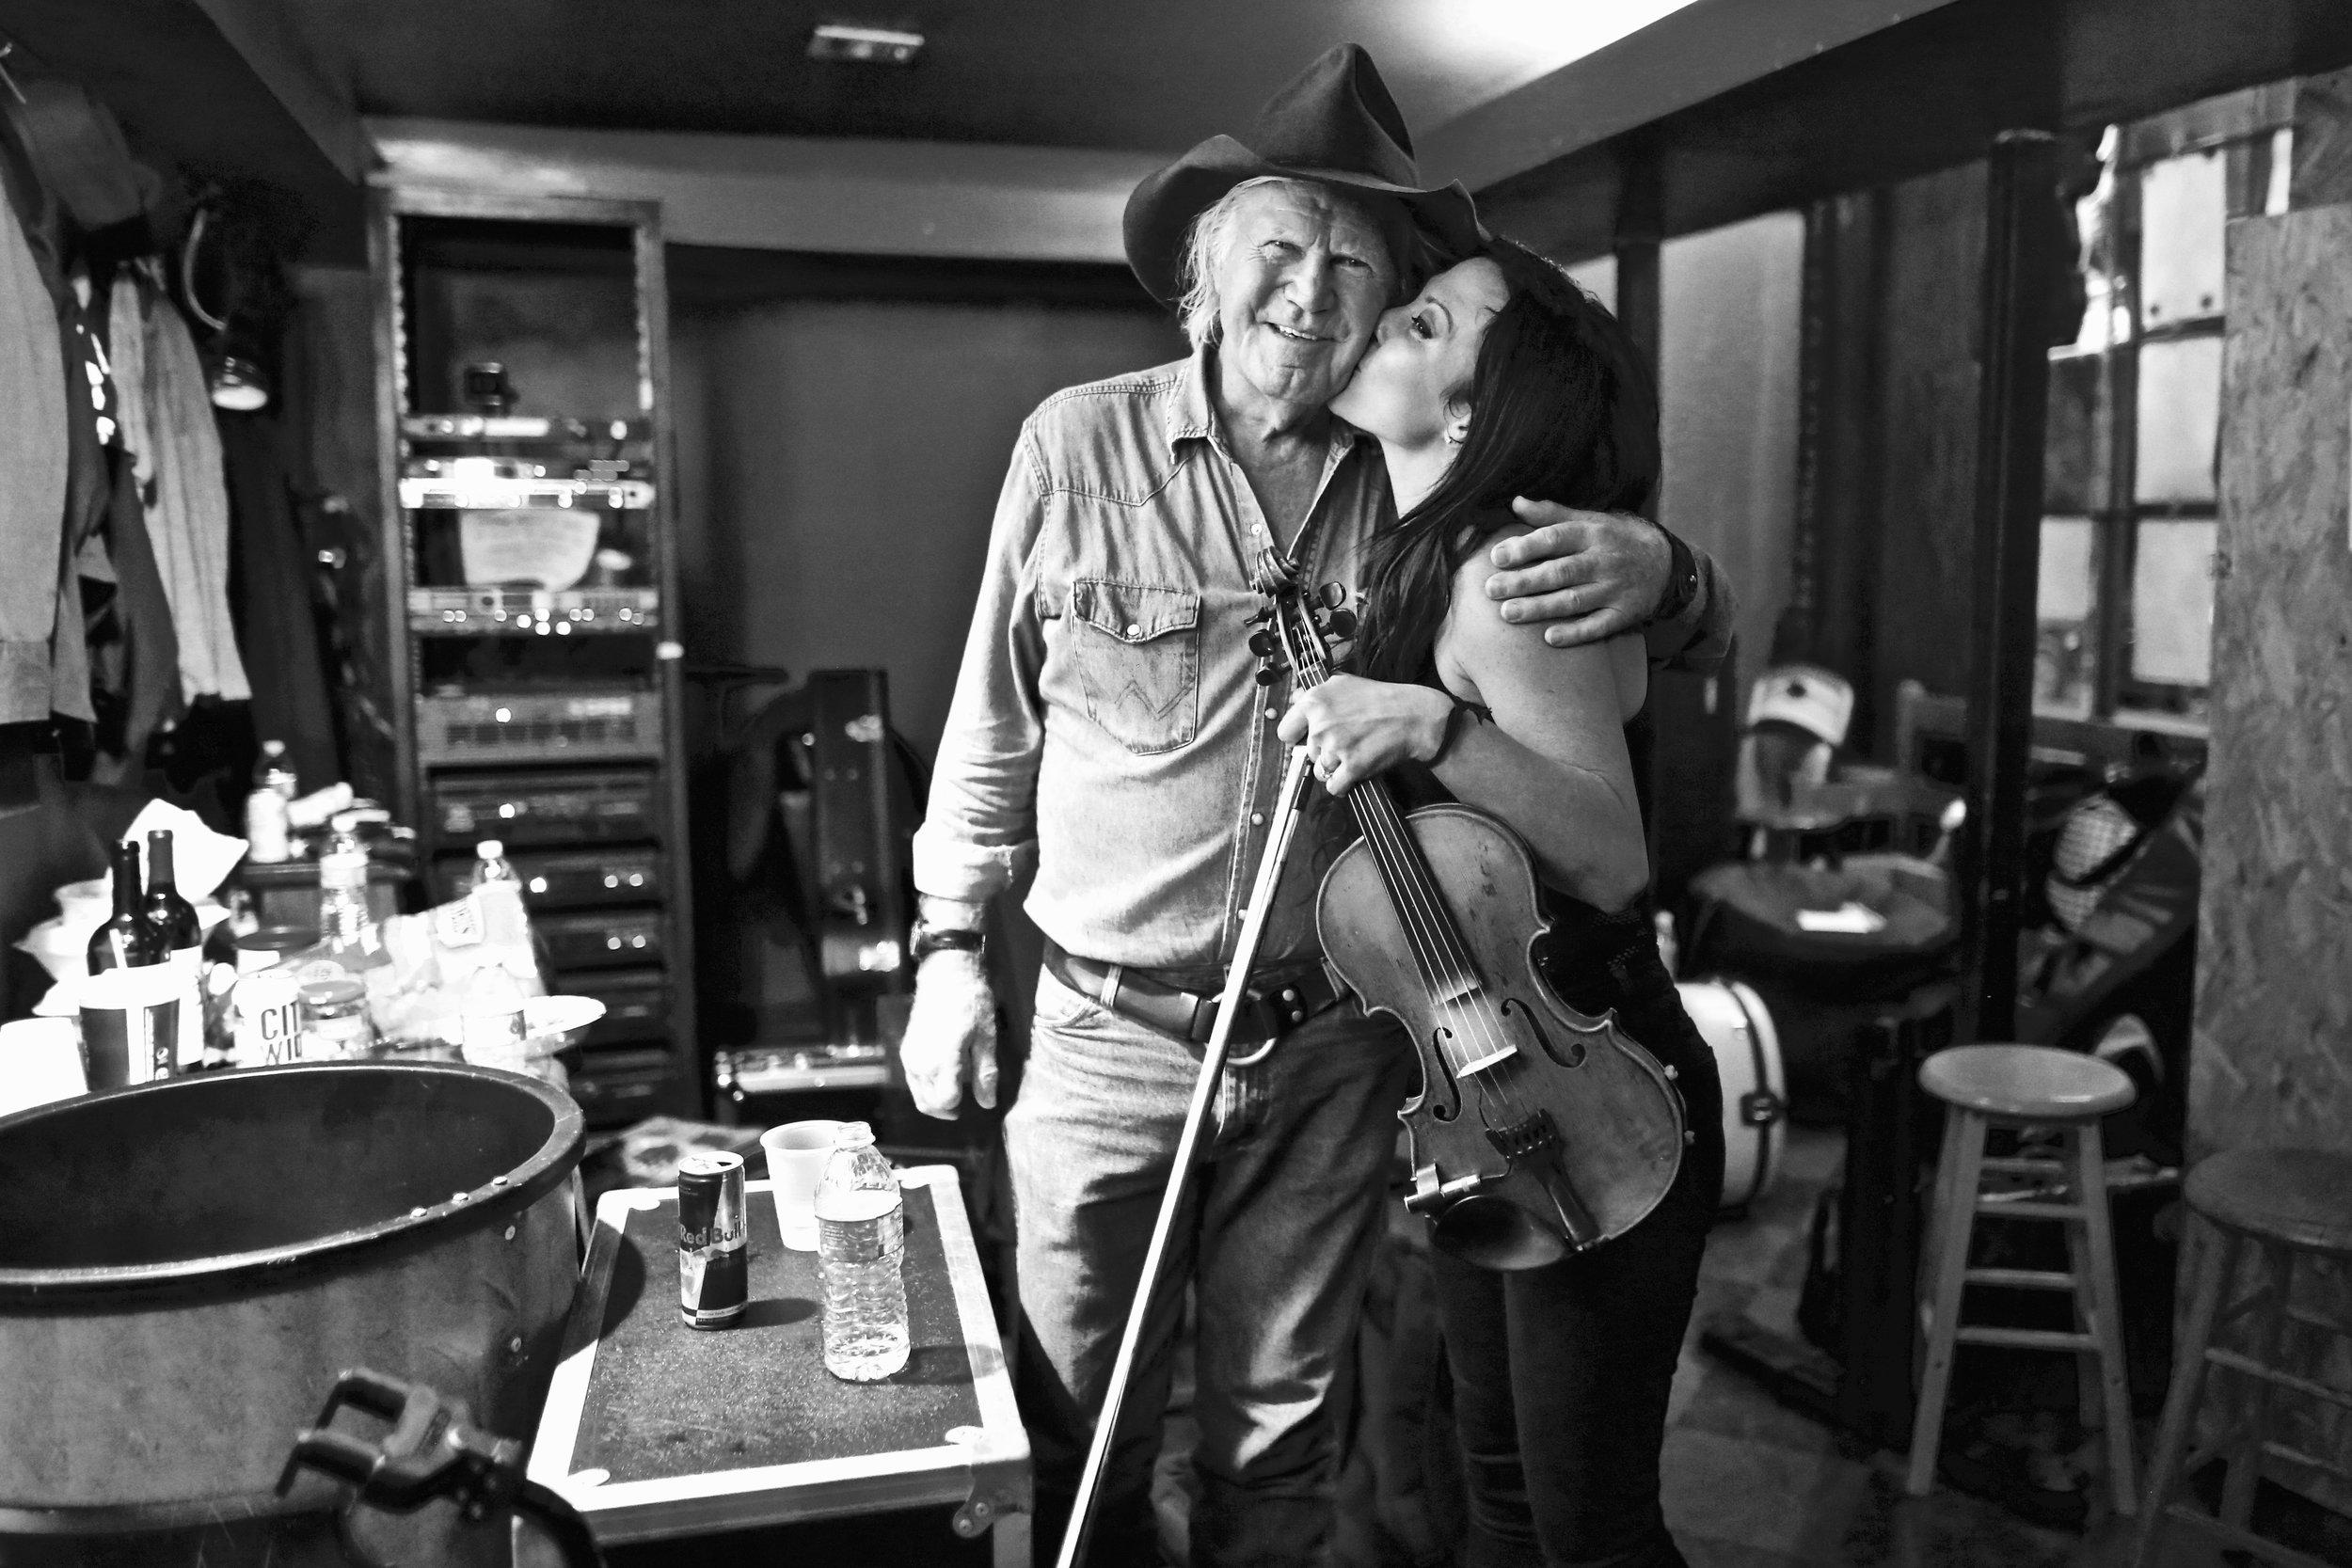 Billy Joe Shaver & Amanda Shires